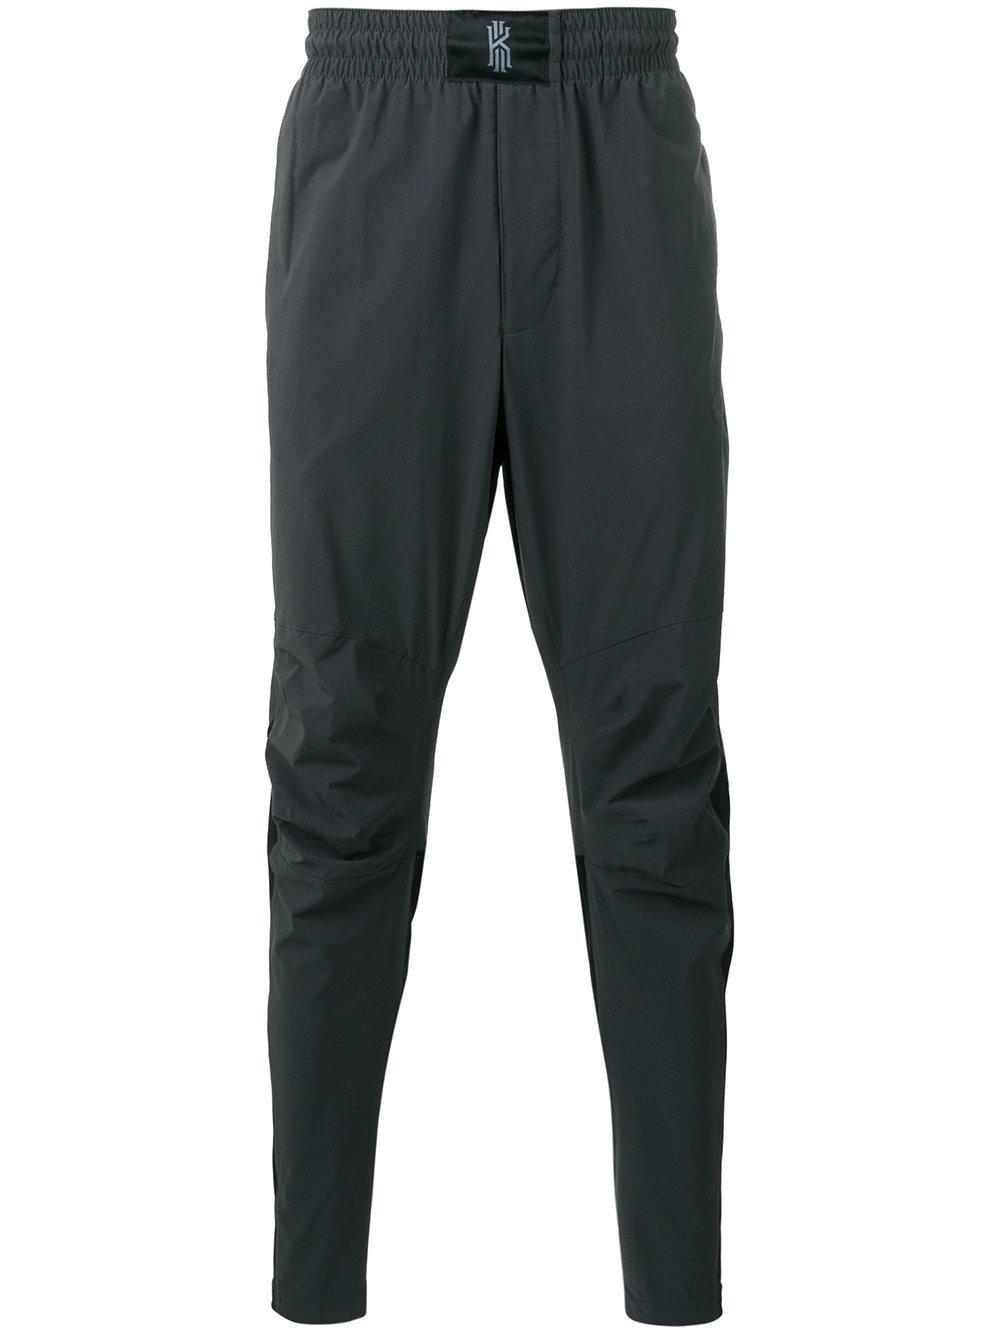 Lyst Nike Flex Kyrie Track Pants In Gray For Men